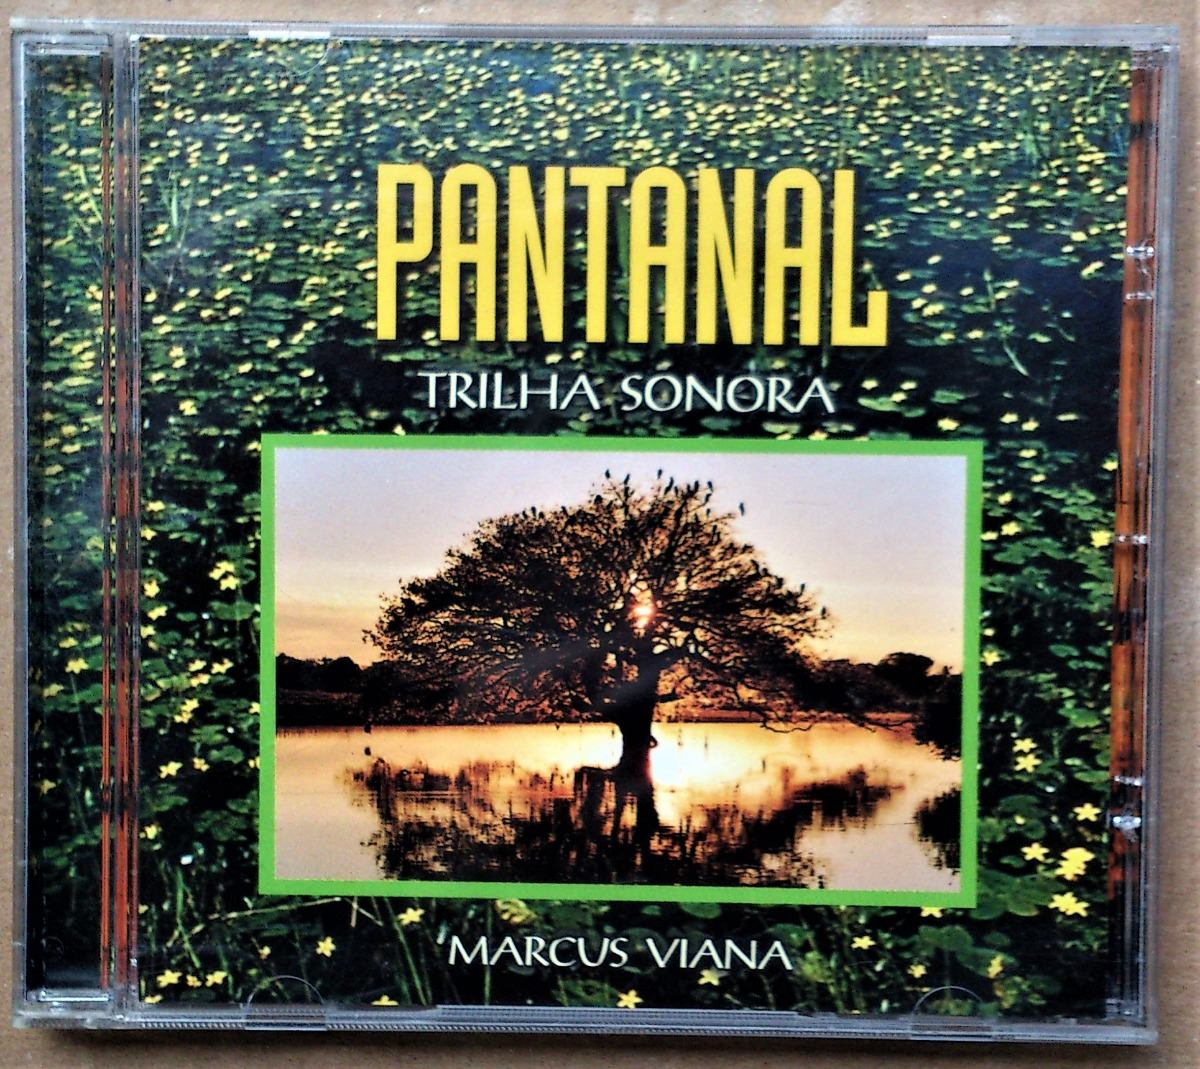 cd trilha sonora pantanal